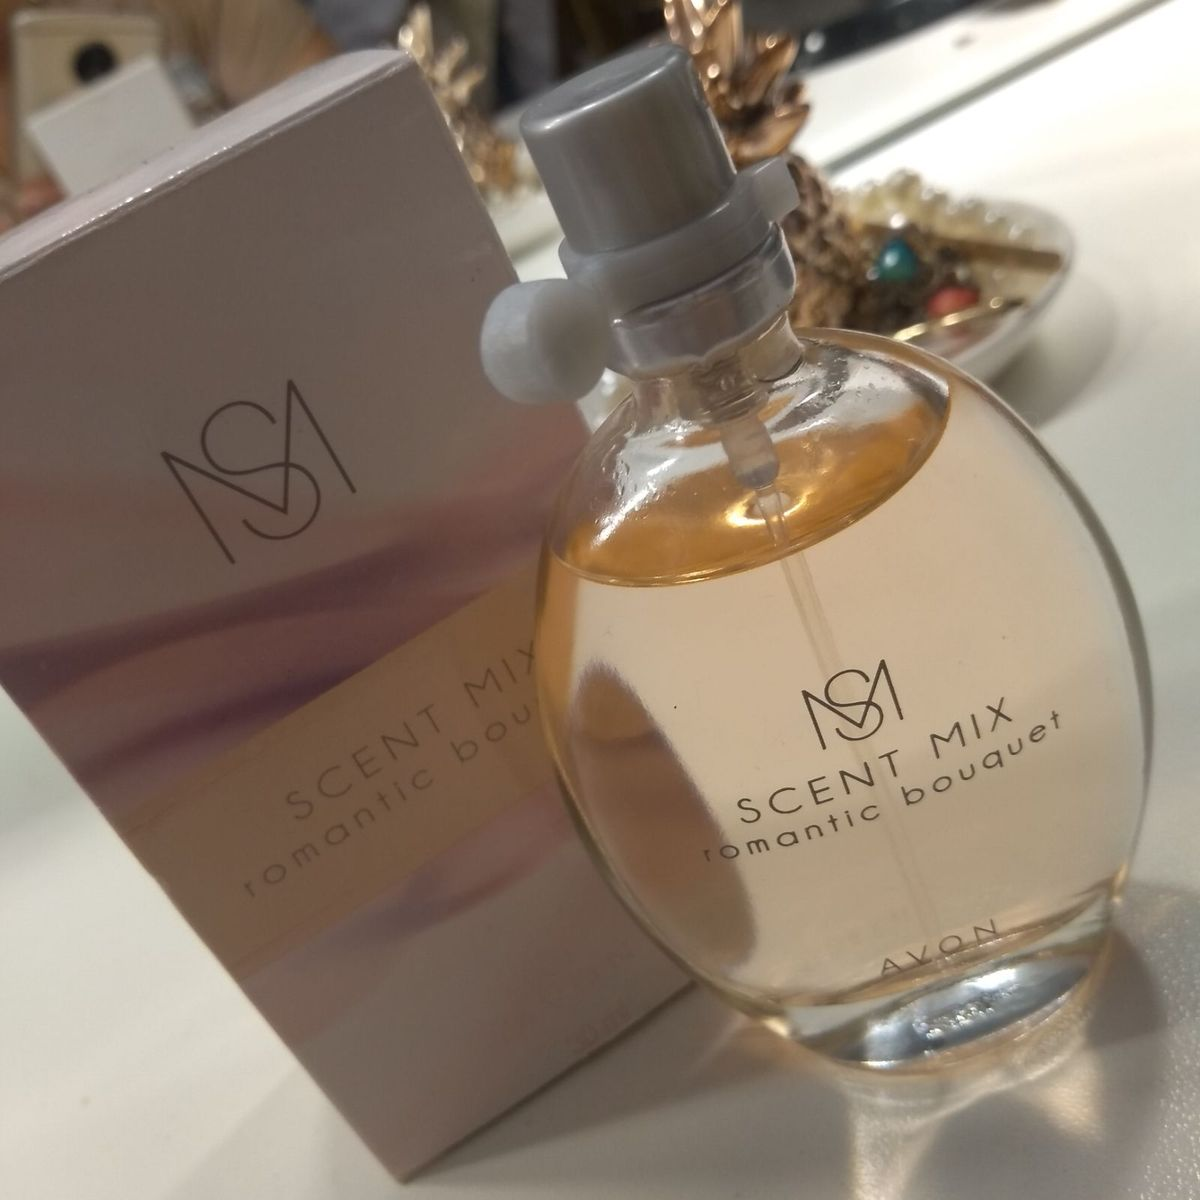 Perfume Scent Mix Perfume Feminino Avon Nunca Usado 37566228 Enjoei